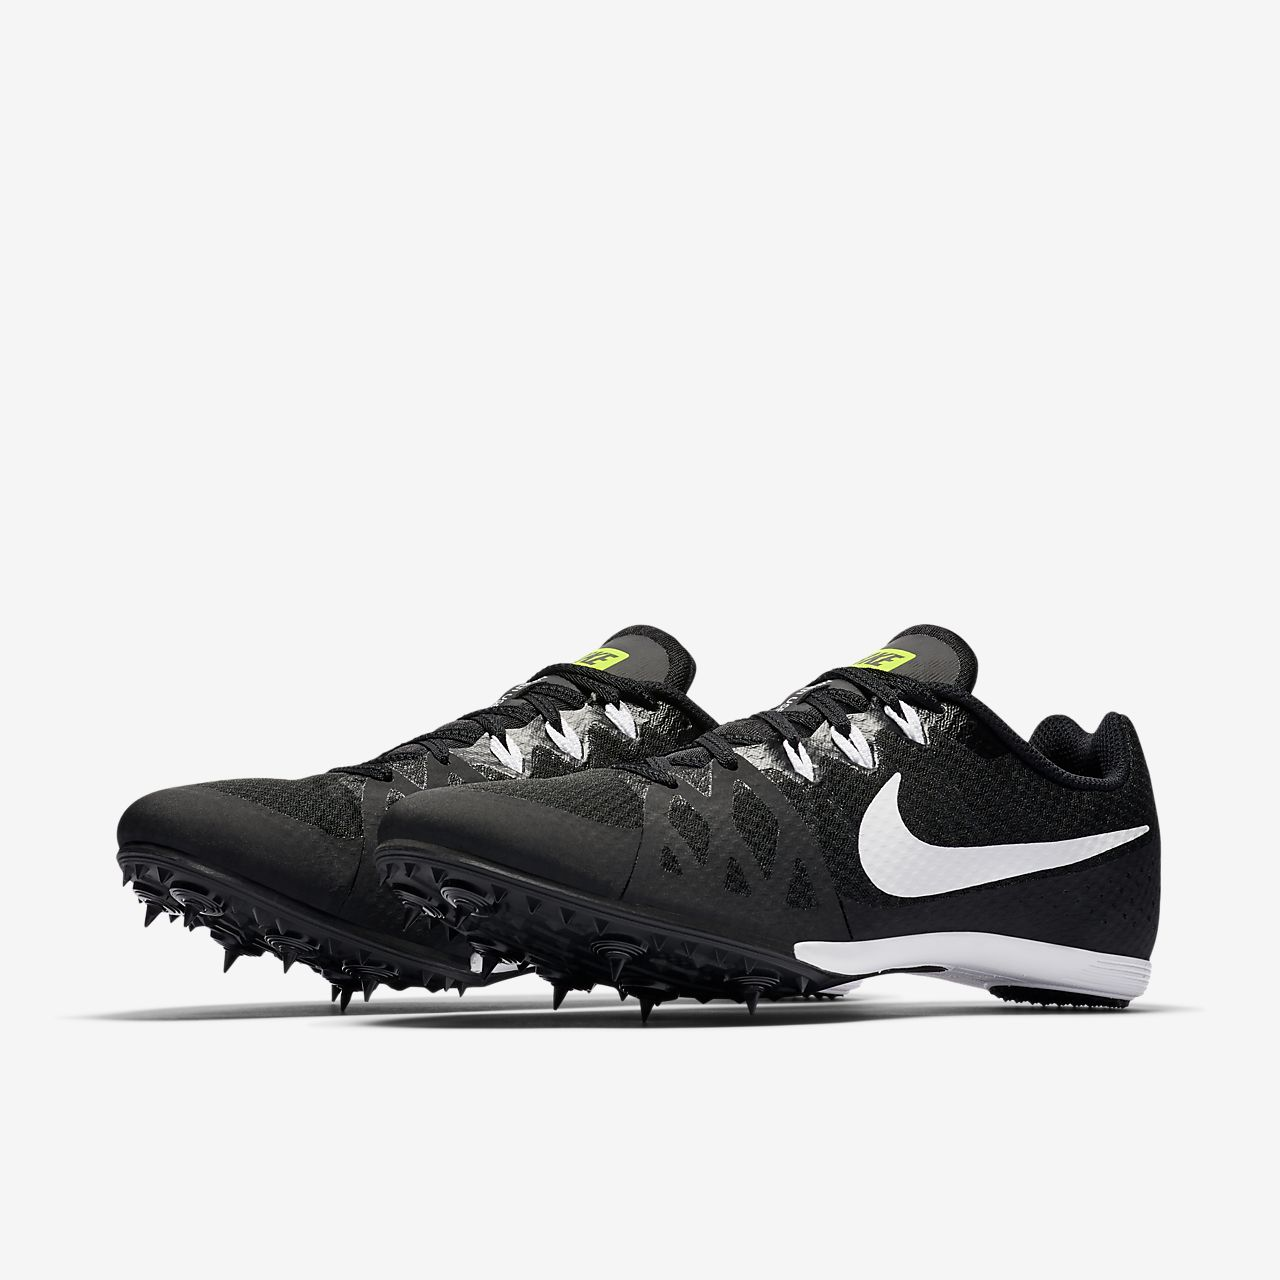 Modelli Nike Chiodate Chiodate Nike Scarpe Modelli Scarpe nm0NOv8ywP